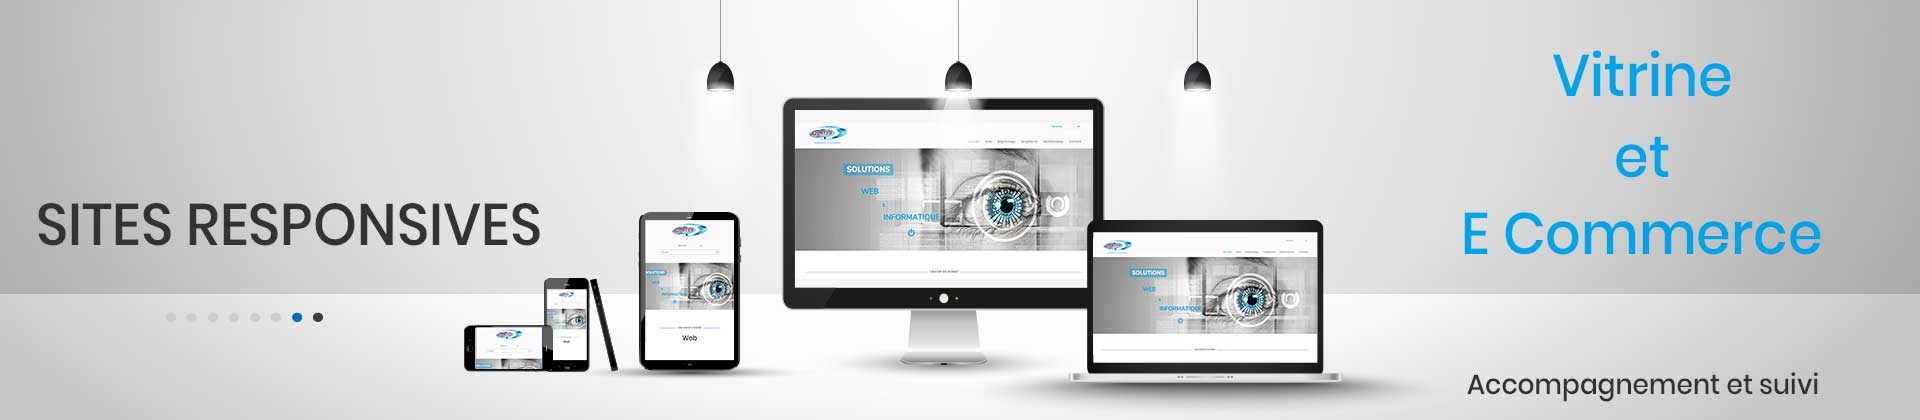 creation-site-responsive